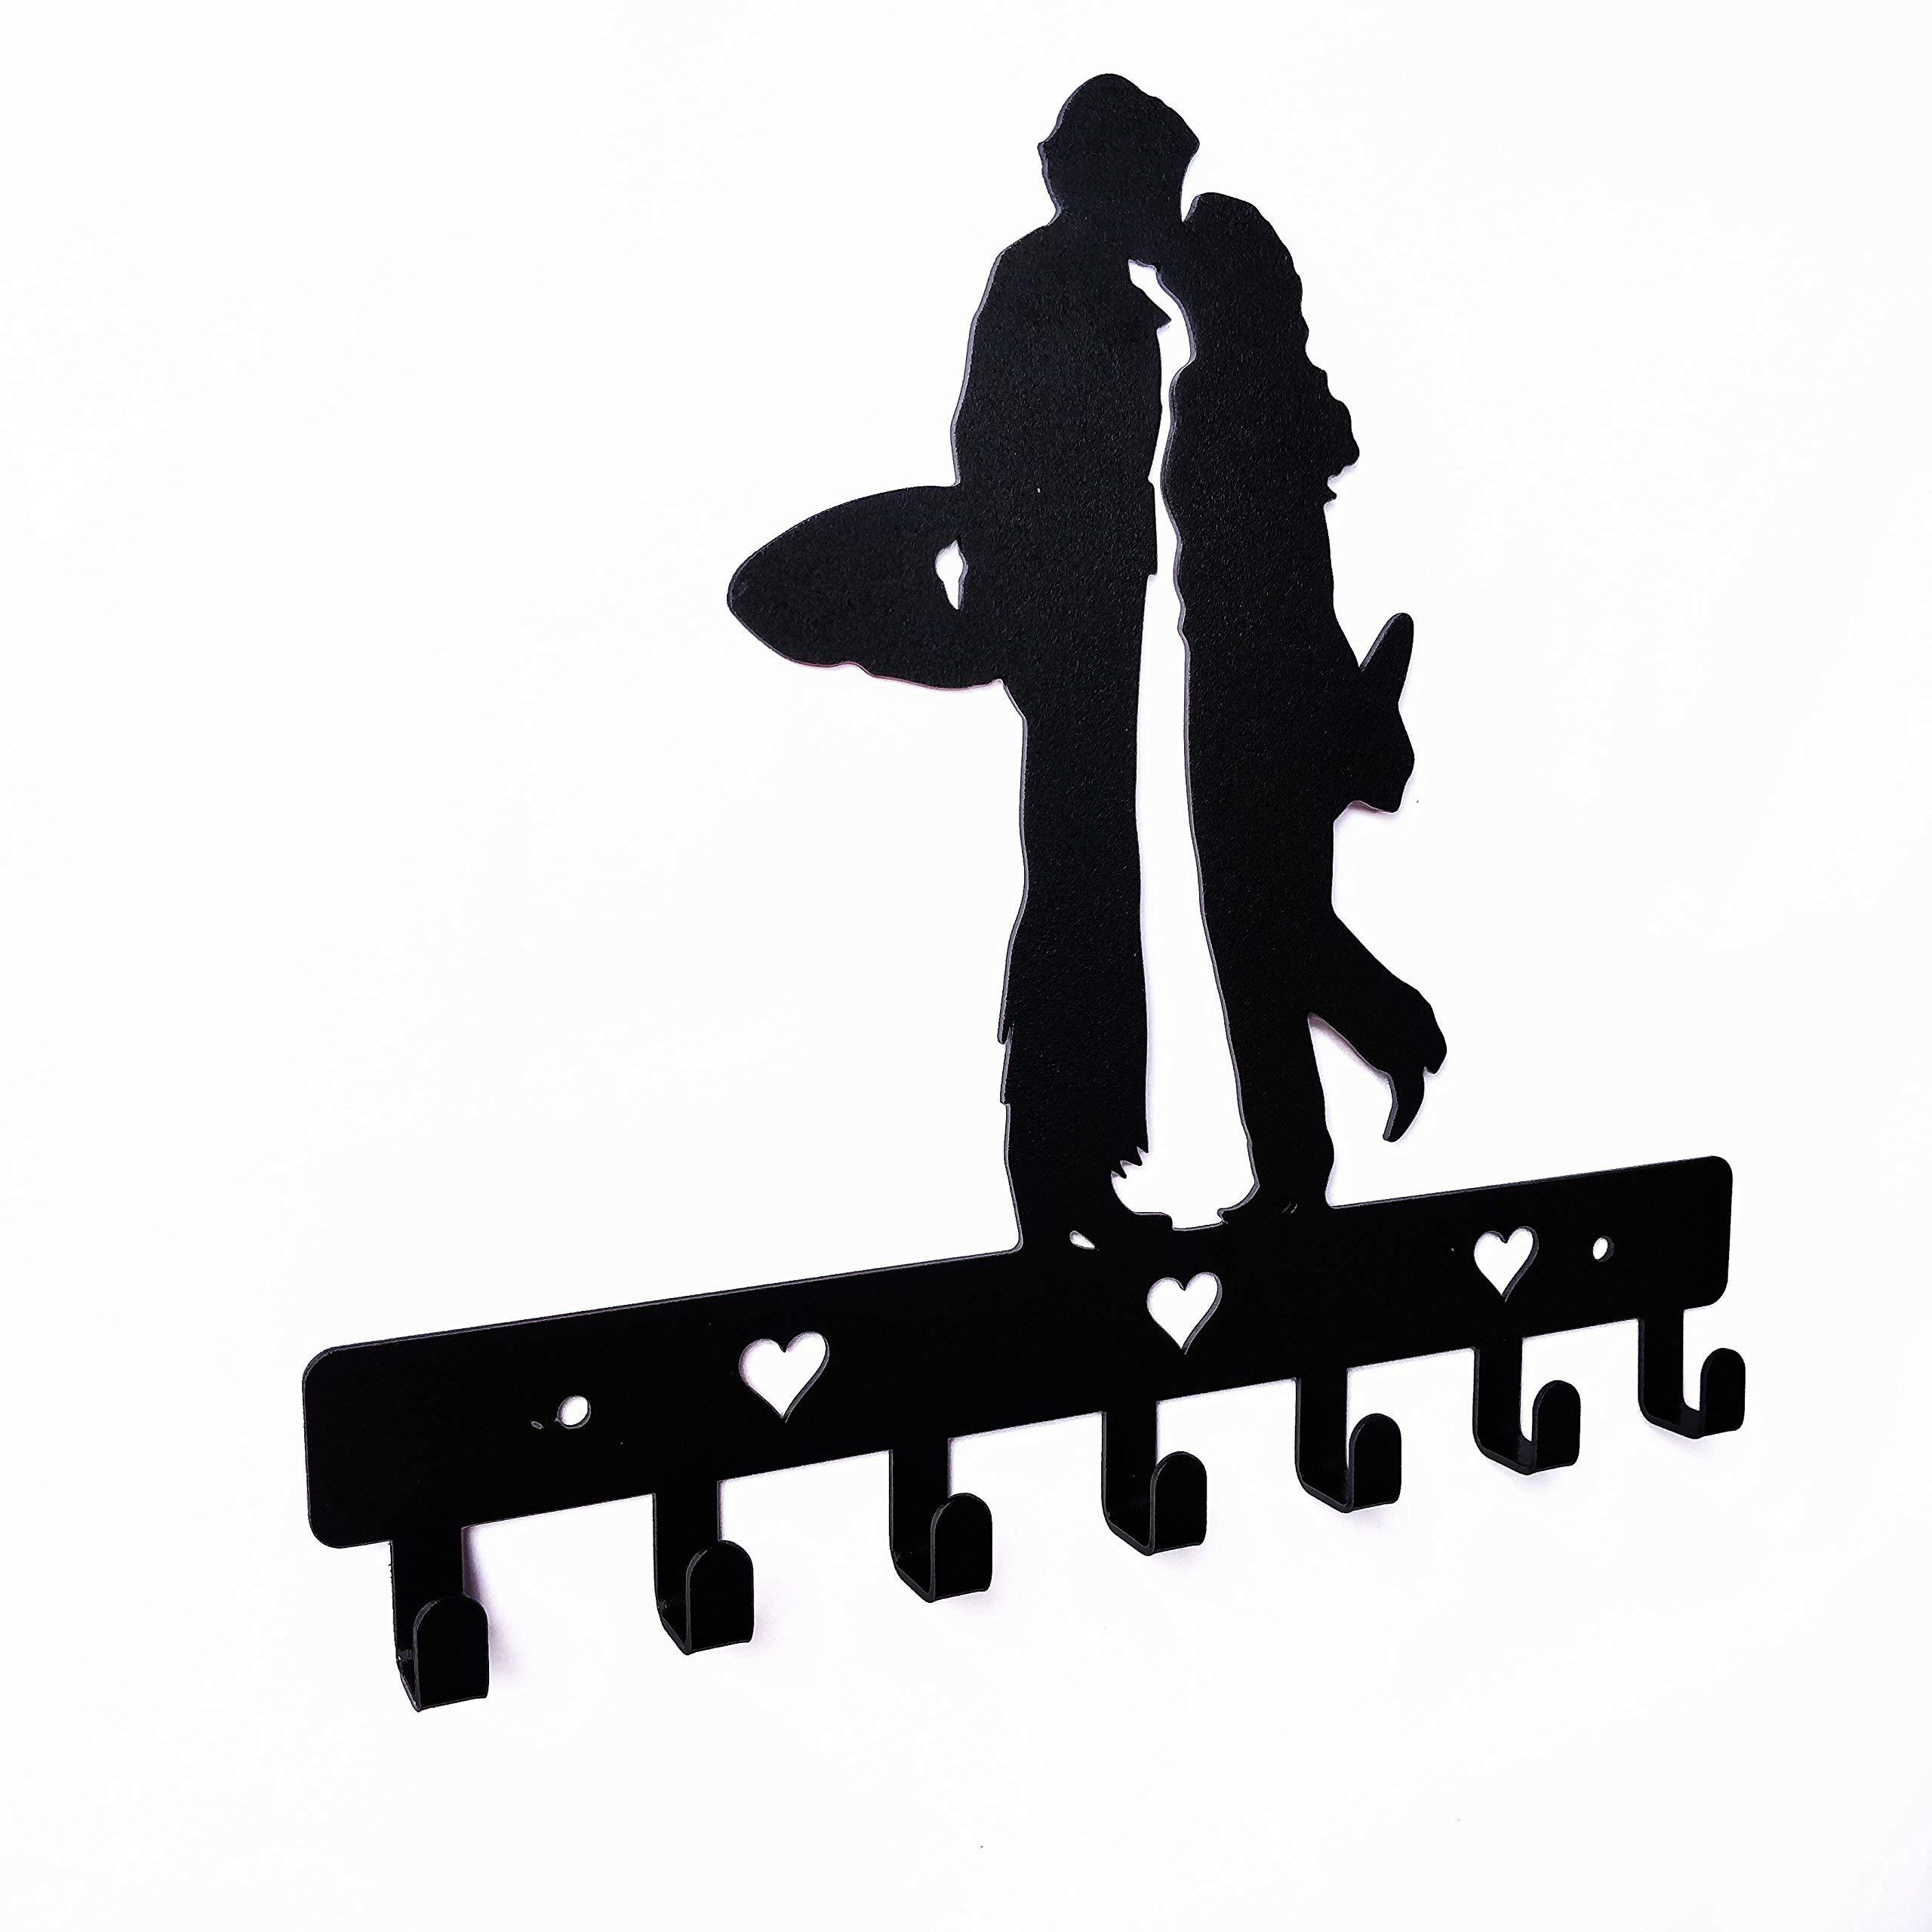 HeavenlyKraft Kissing Couple Wall Mounted Metal Key Holder Size 10.6X 7.5 X .8 inch Key Hanger, Medal Hanger, Leash Hanger, Key Organizer, Metal Key Hook,Black